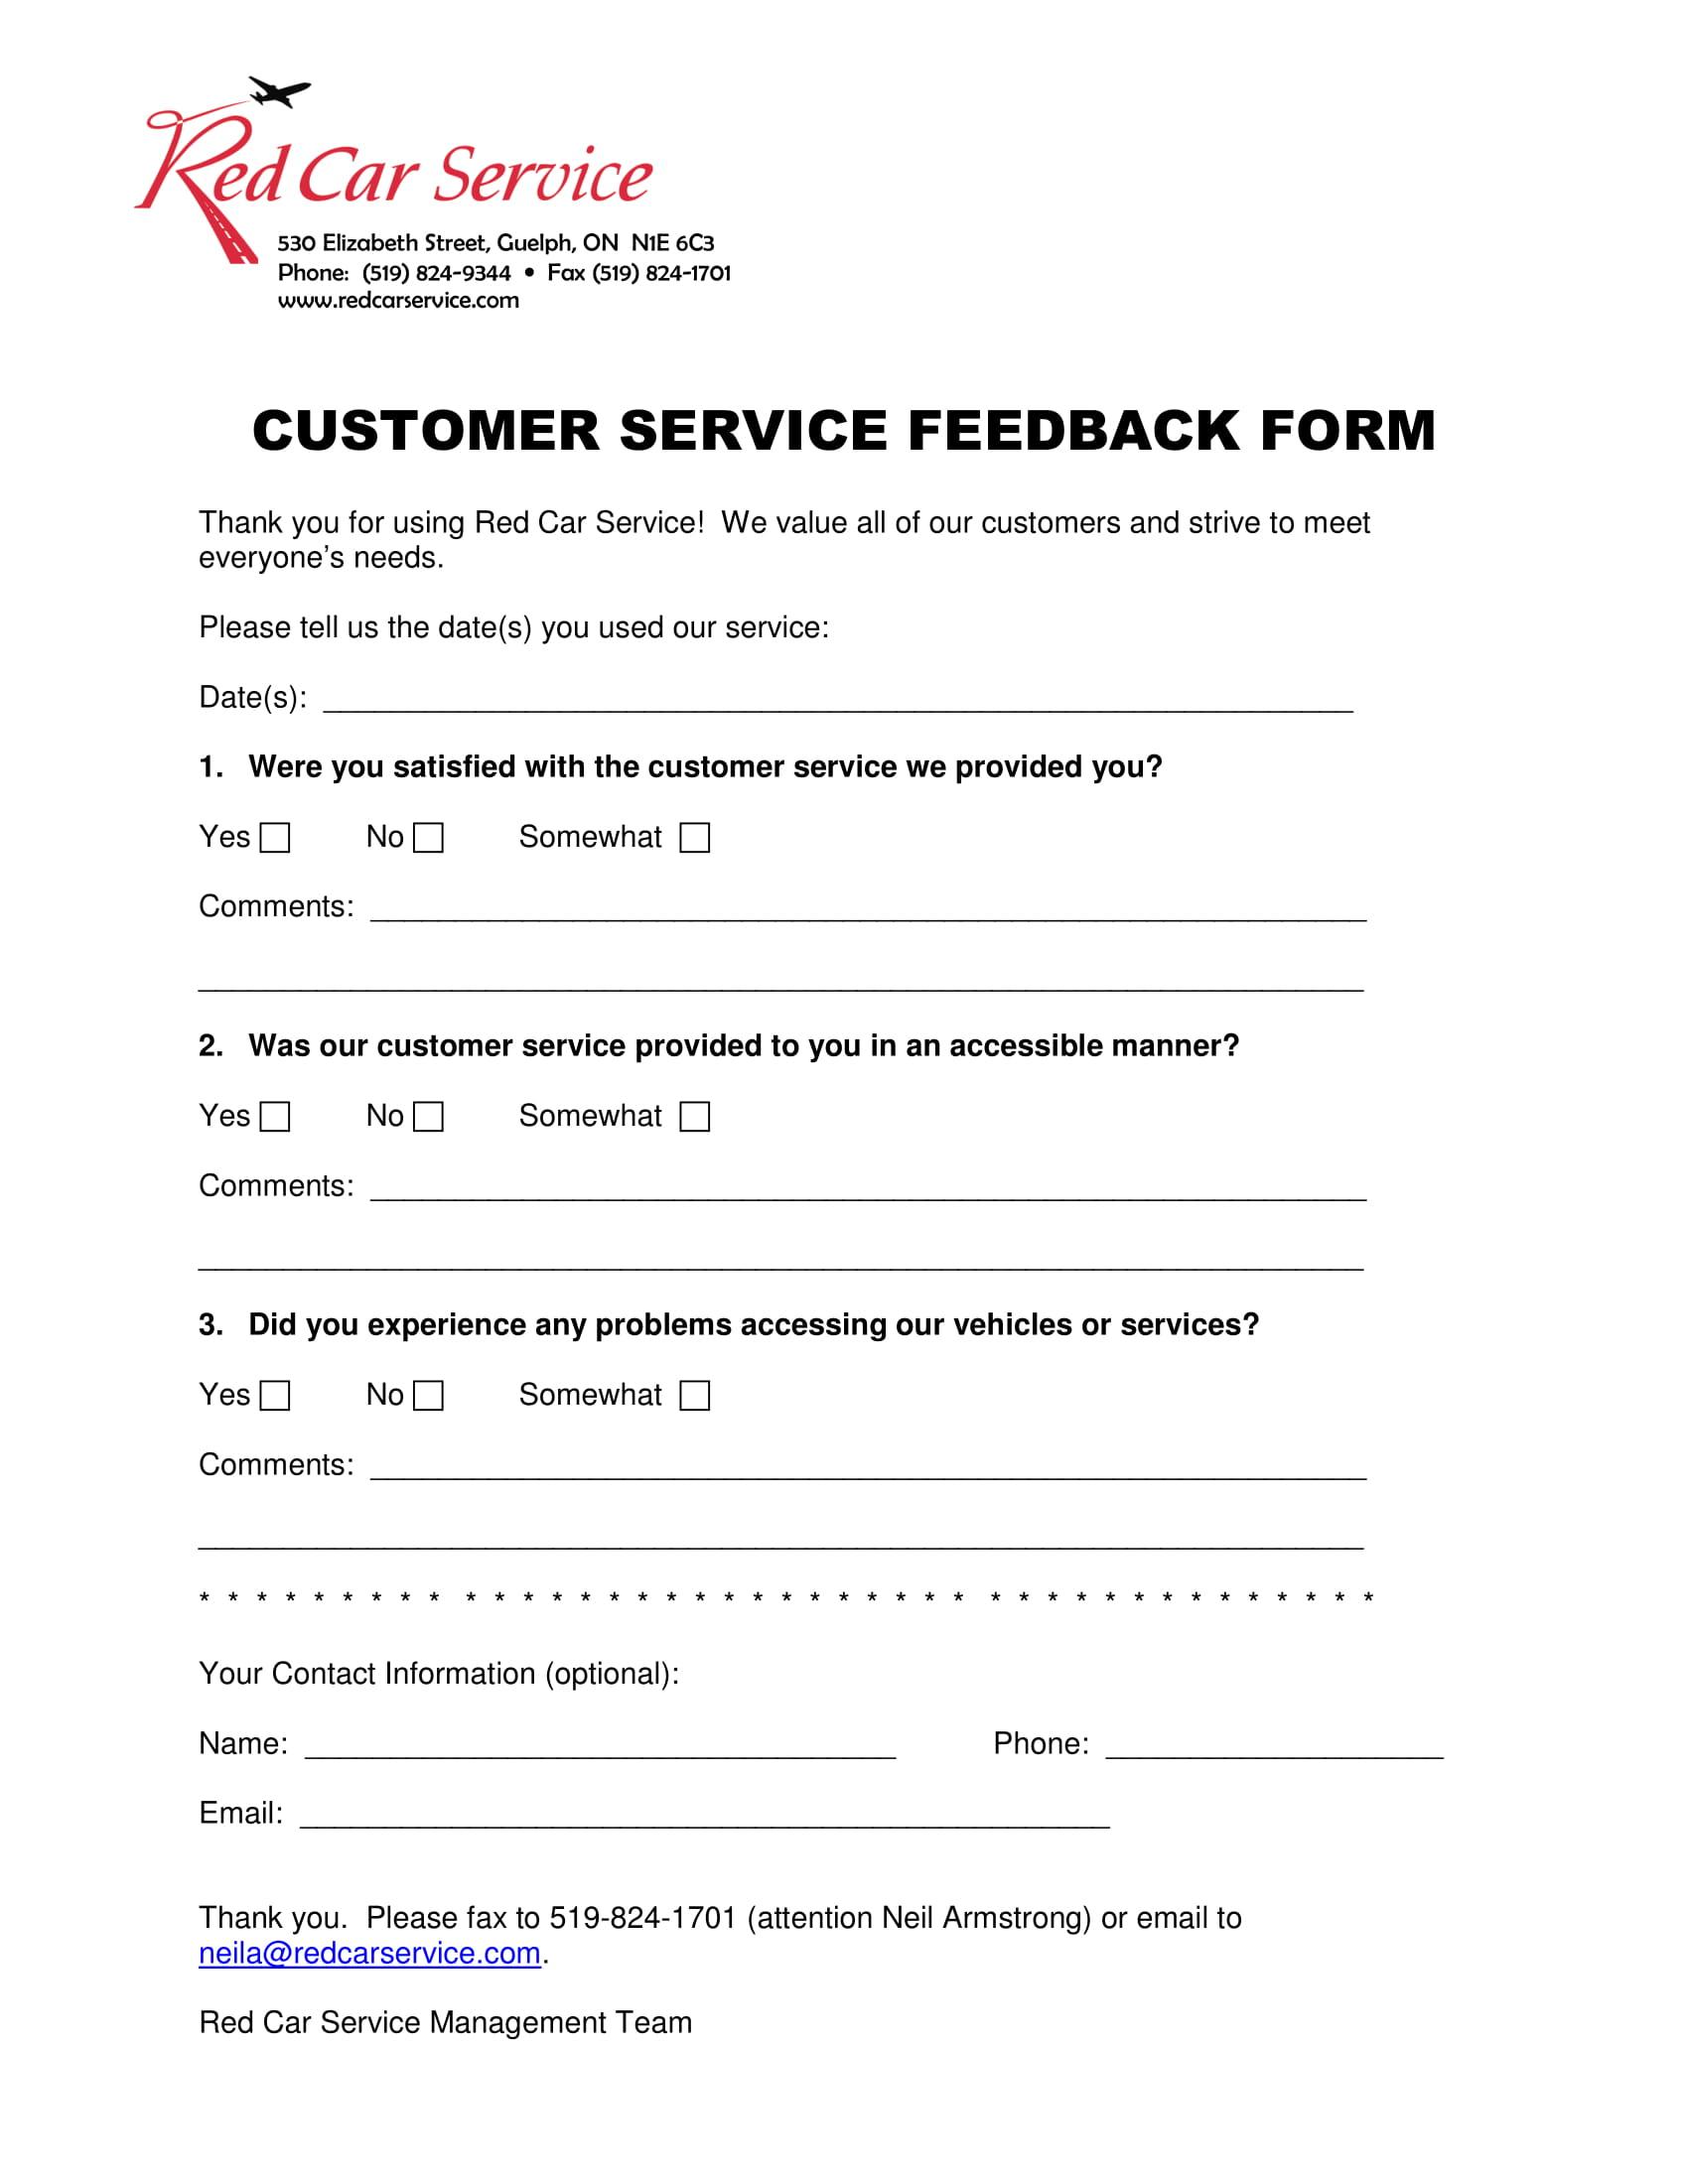 customer service feedback form 1